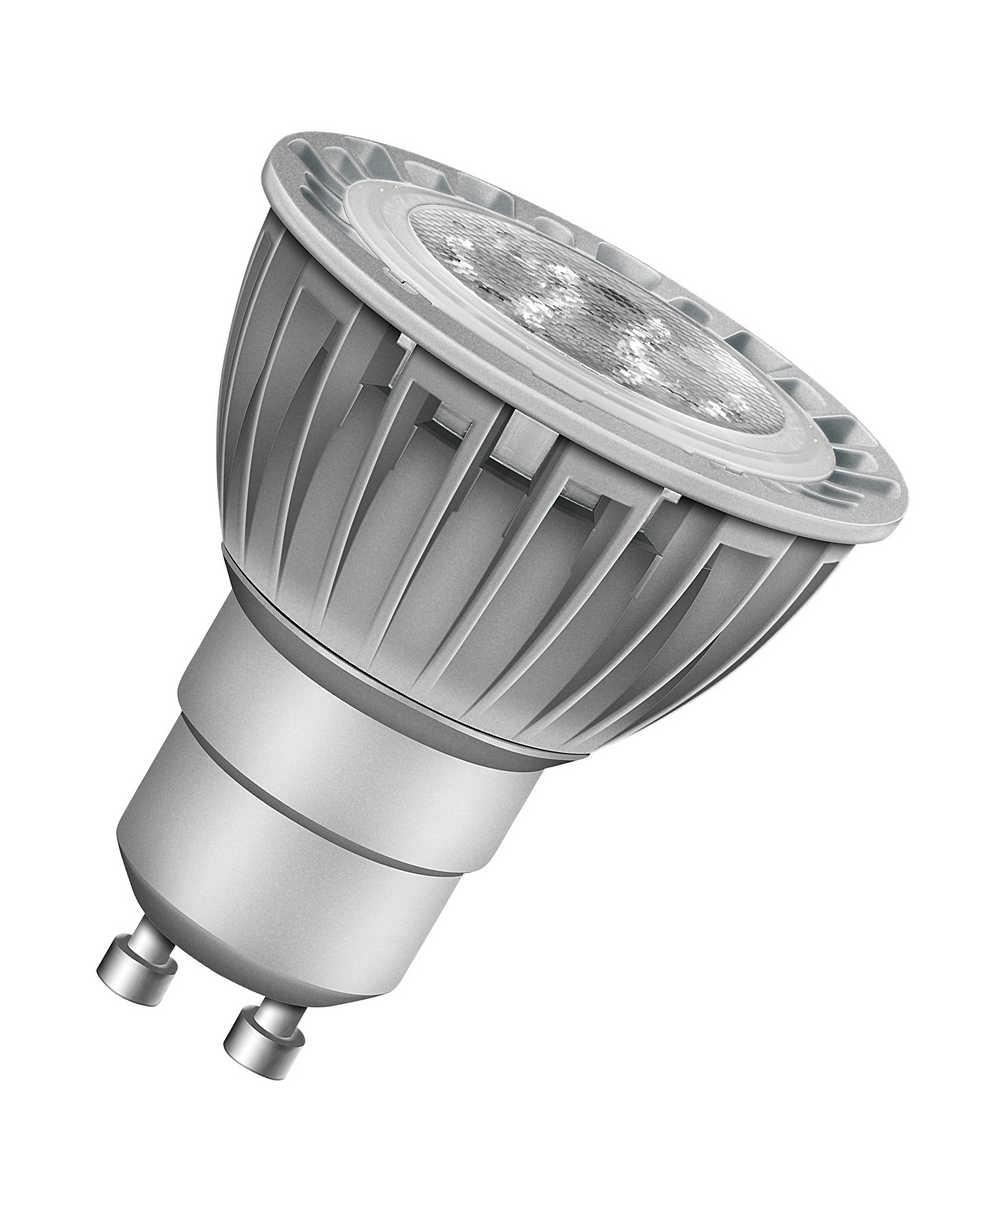 LED SUPERSTAR PAR16 35DIM GU10 4.8W